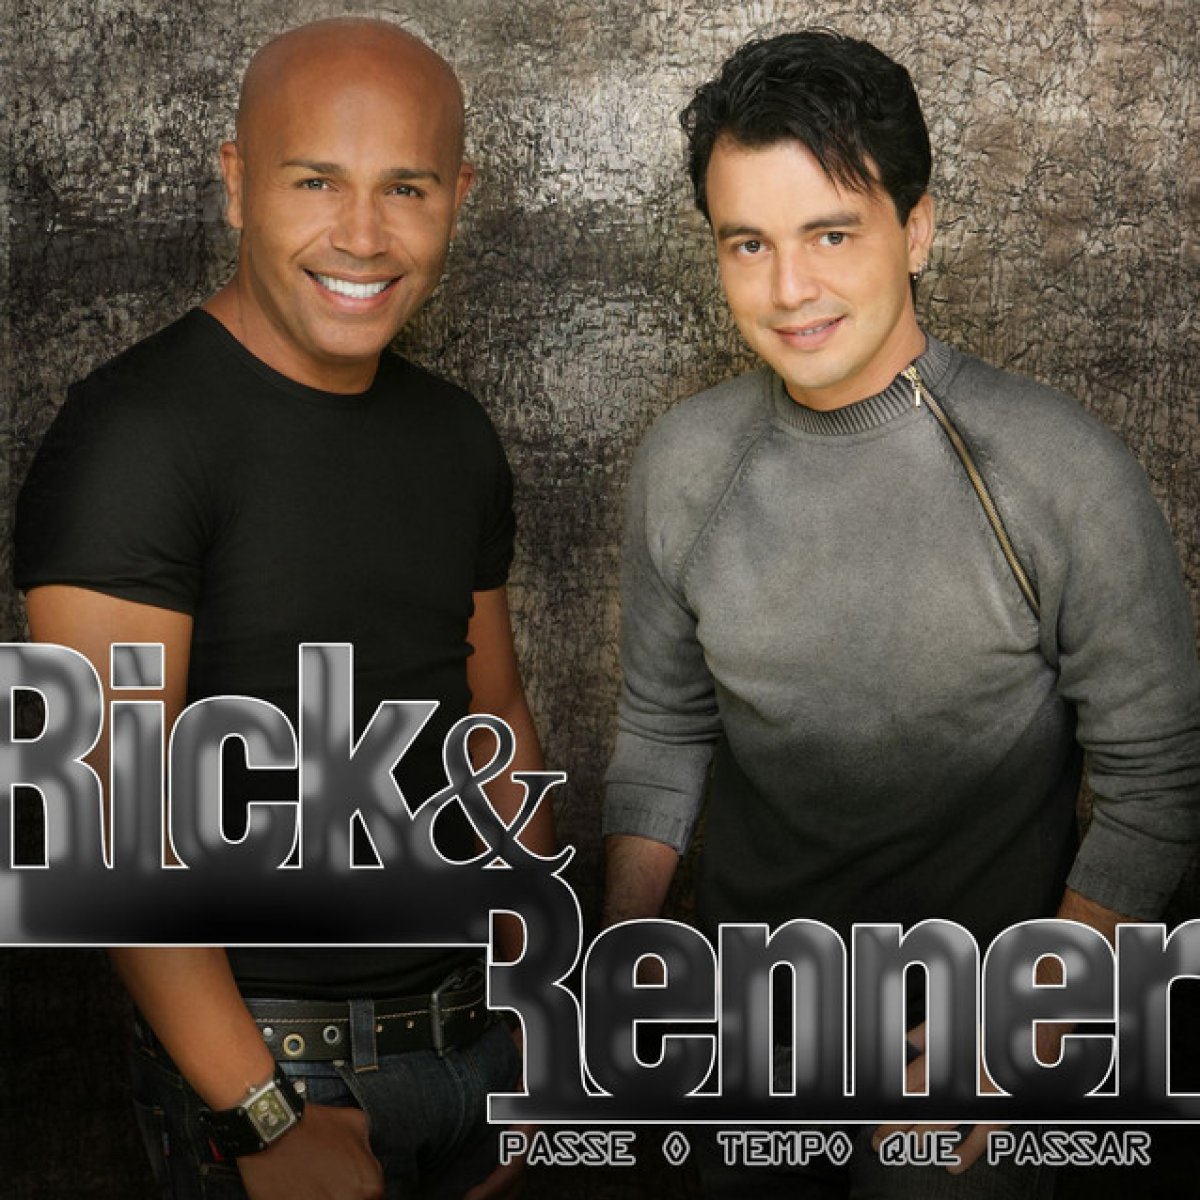 Passe o tempo que passar - Rick e Renner